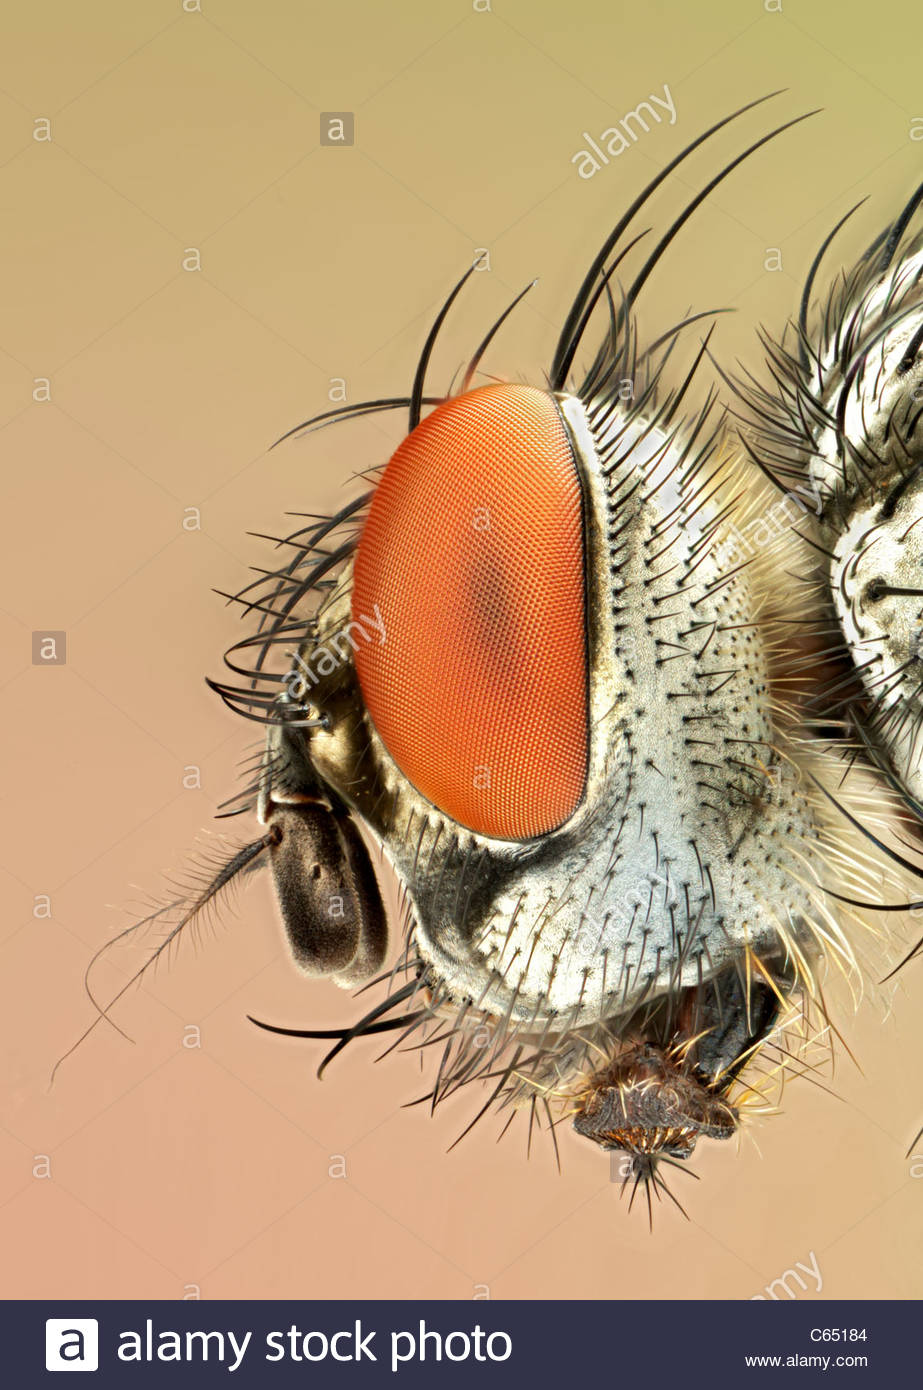 Fleisch-Fly (Scatophaga SP.), Nahaufnahme des Kopfes. Stockbild